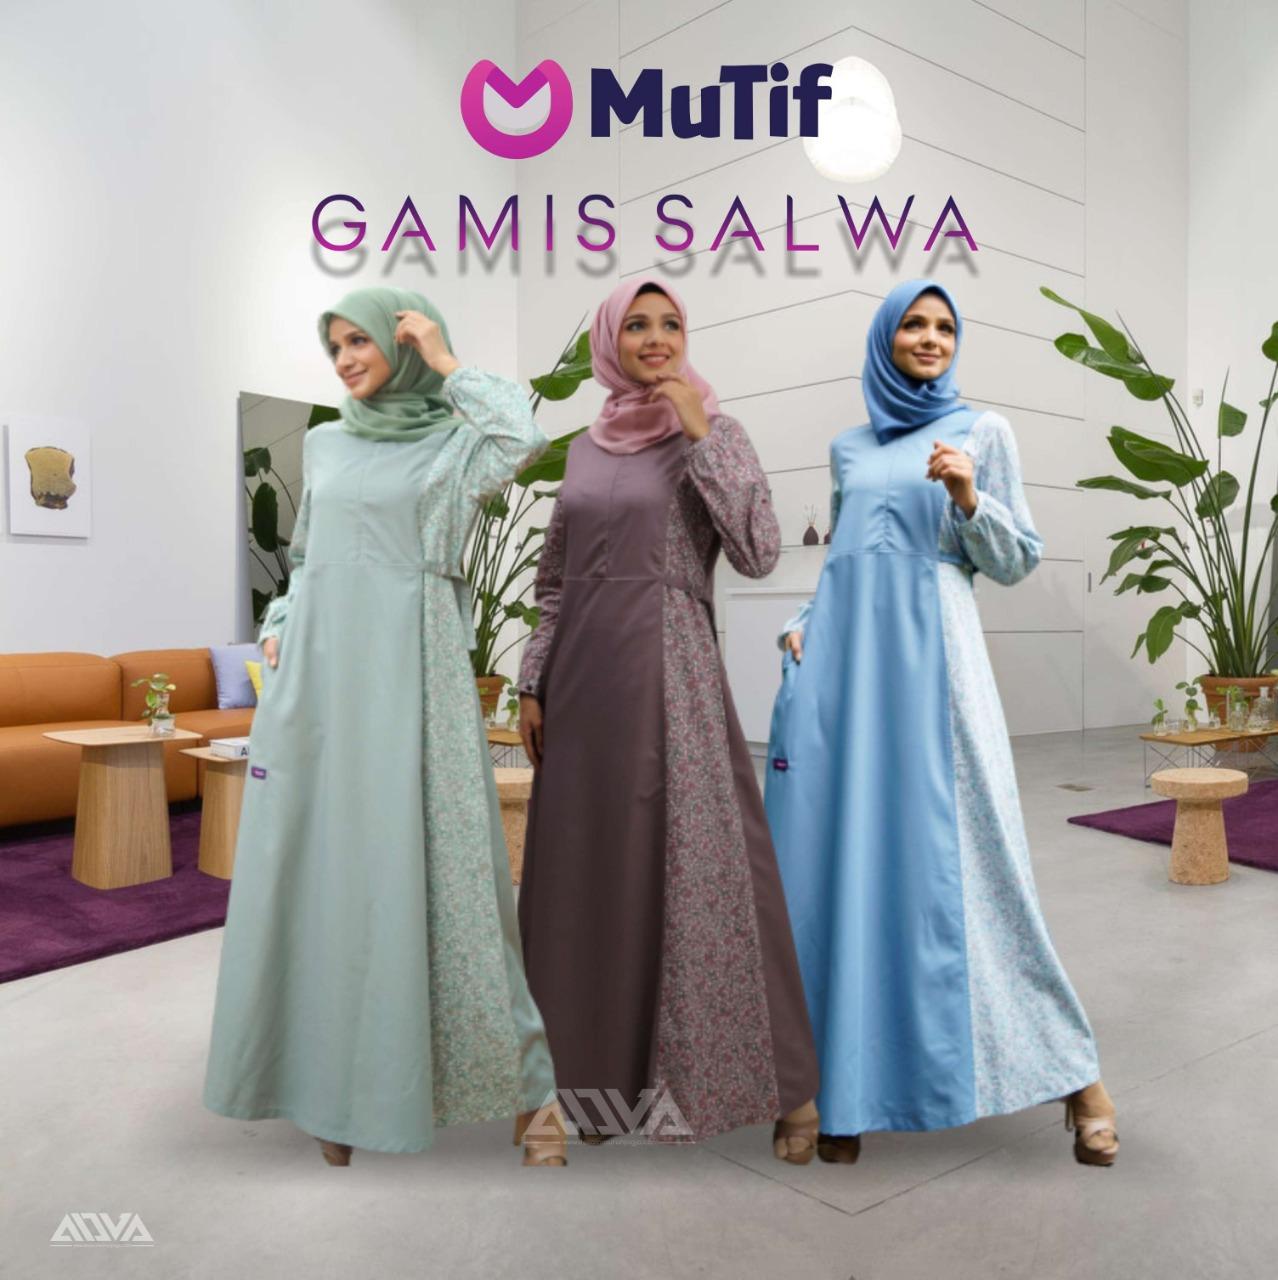 Gamis Katun Original Mutif Salwa New Arrival Lazada Indonesia